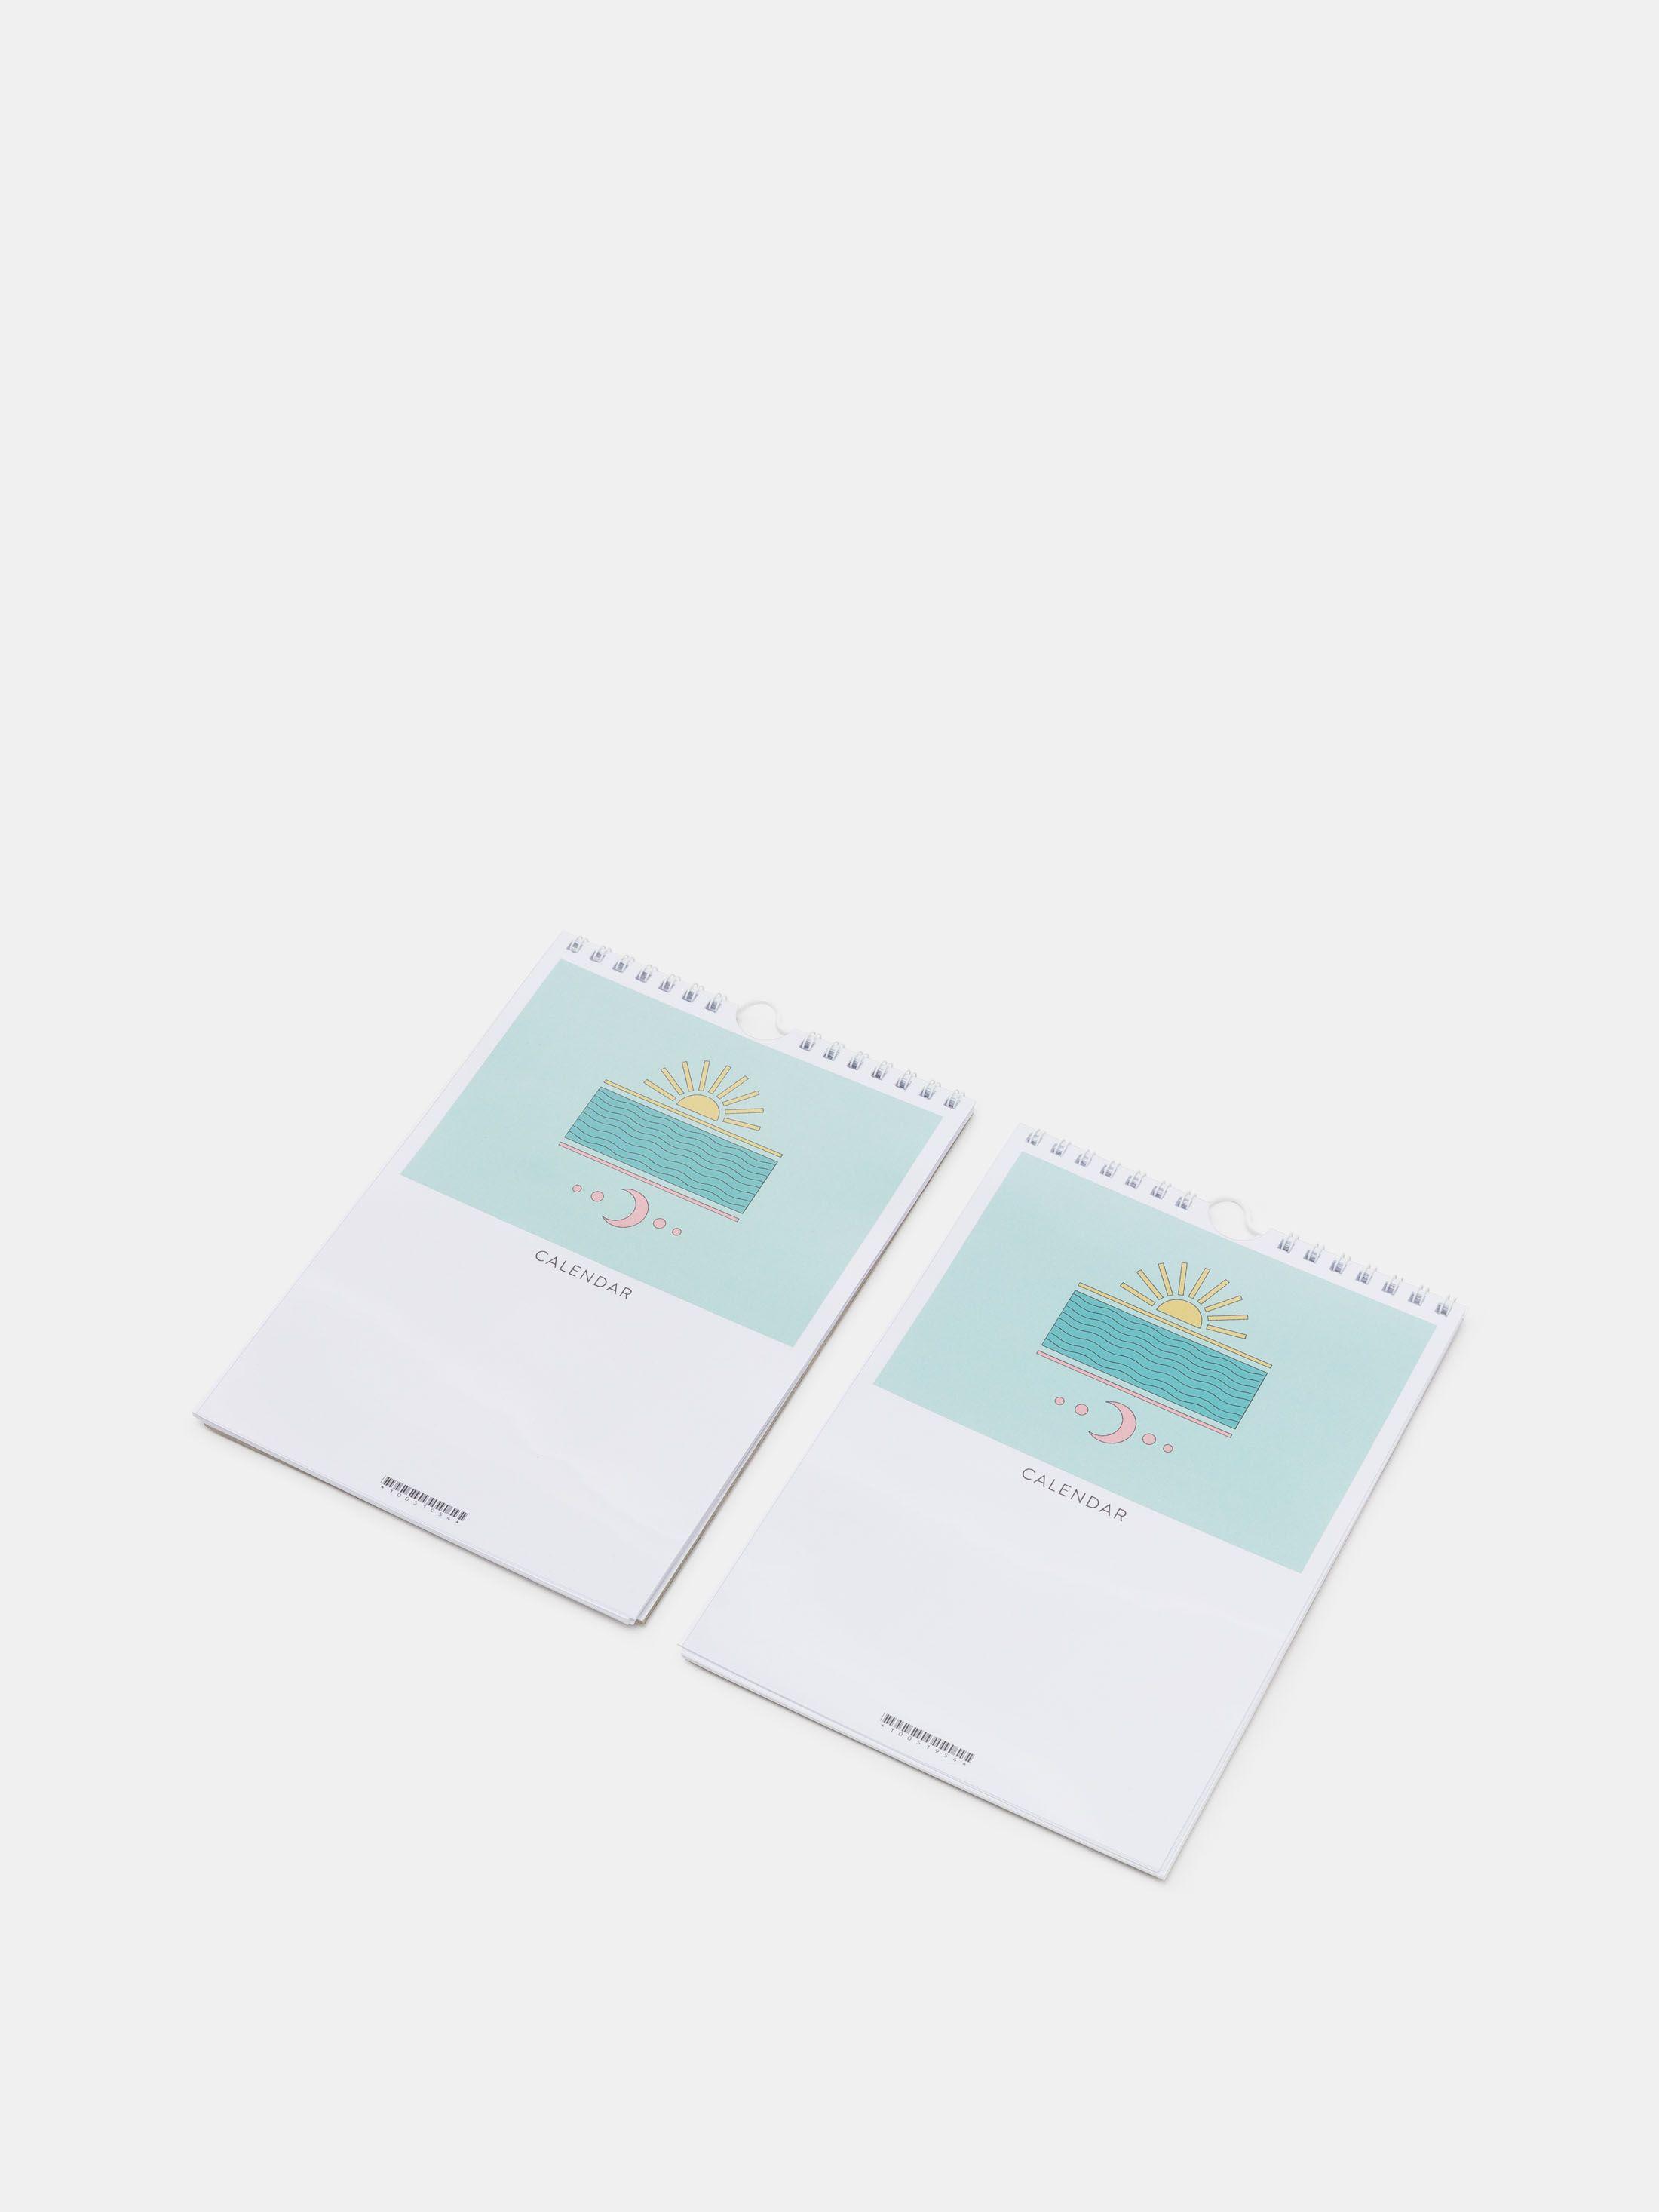 Custom 2022 calendar